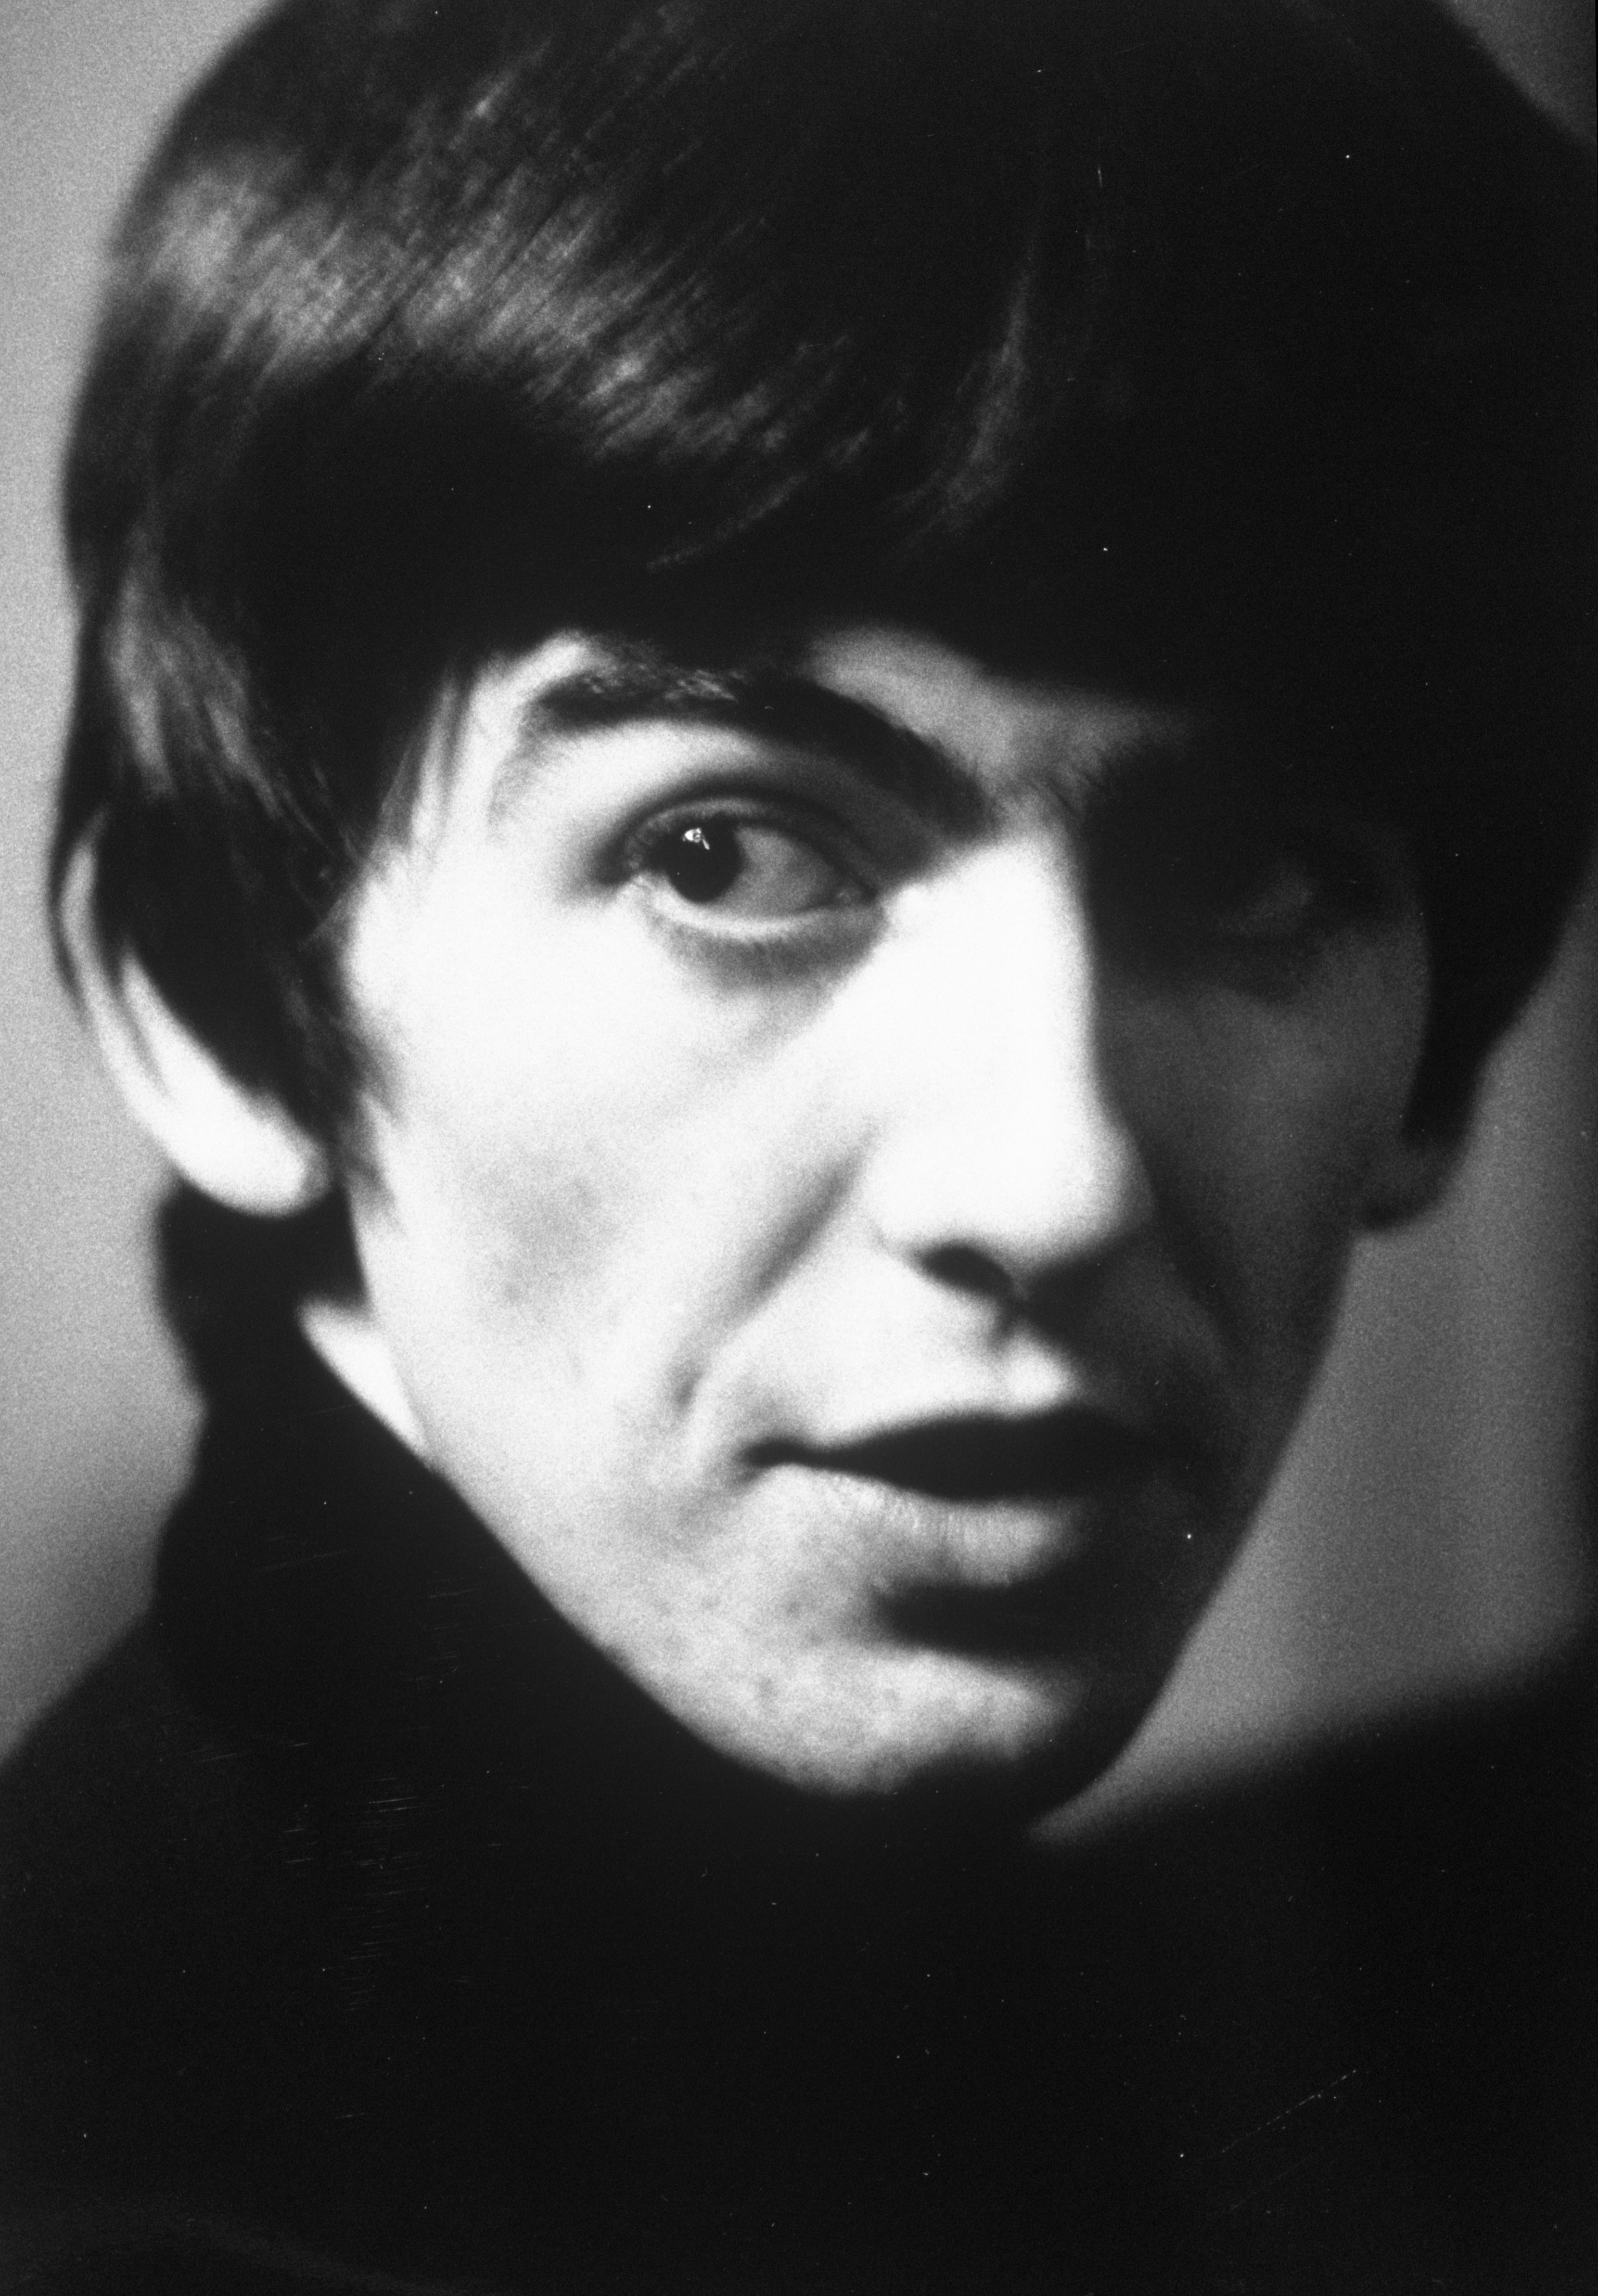 George Harrison 1964